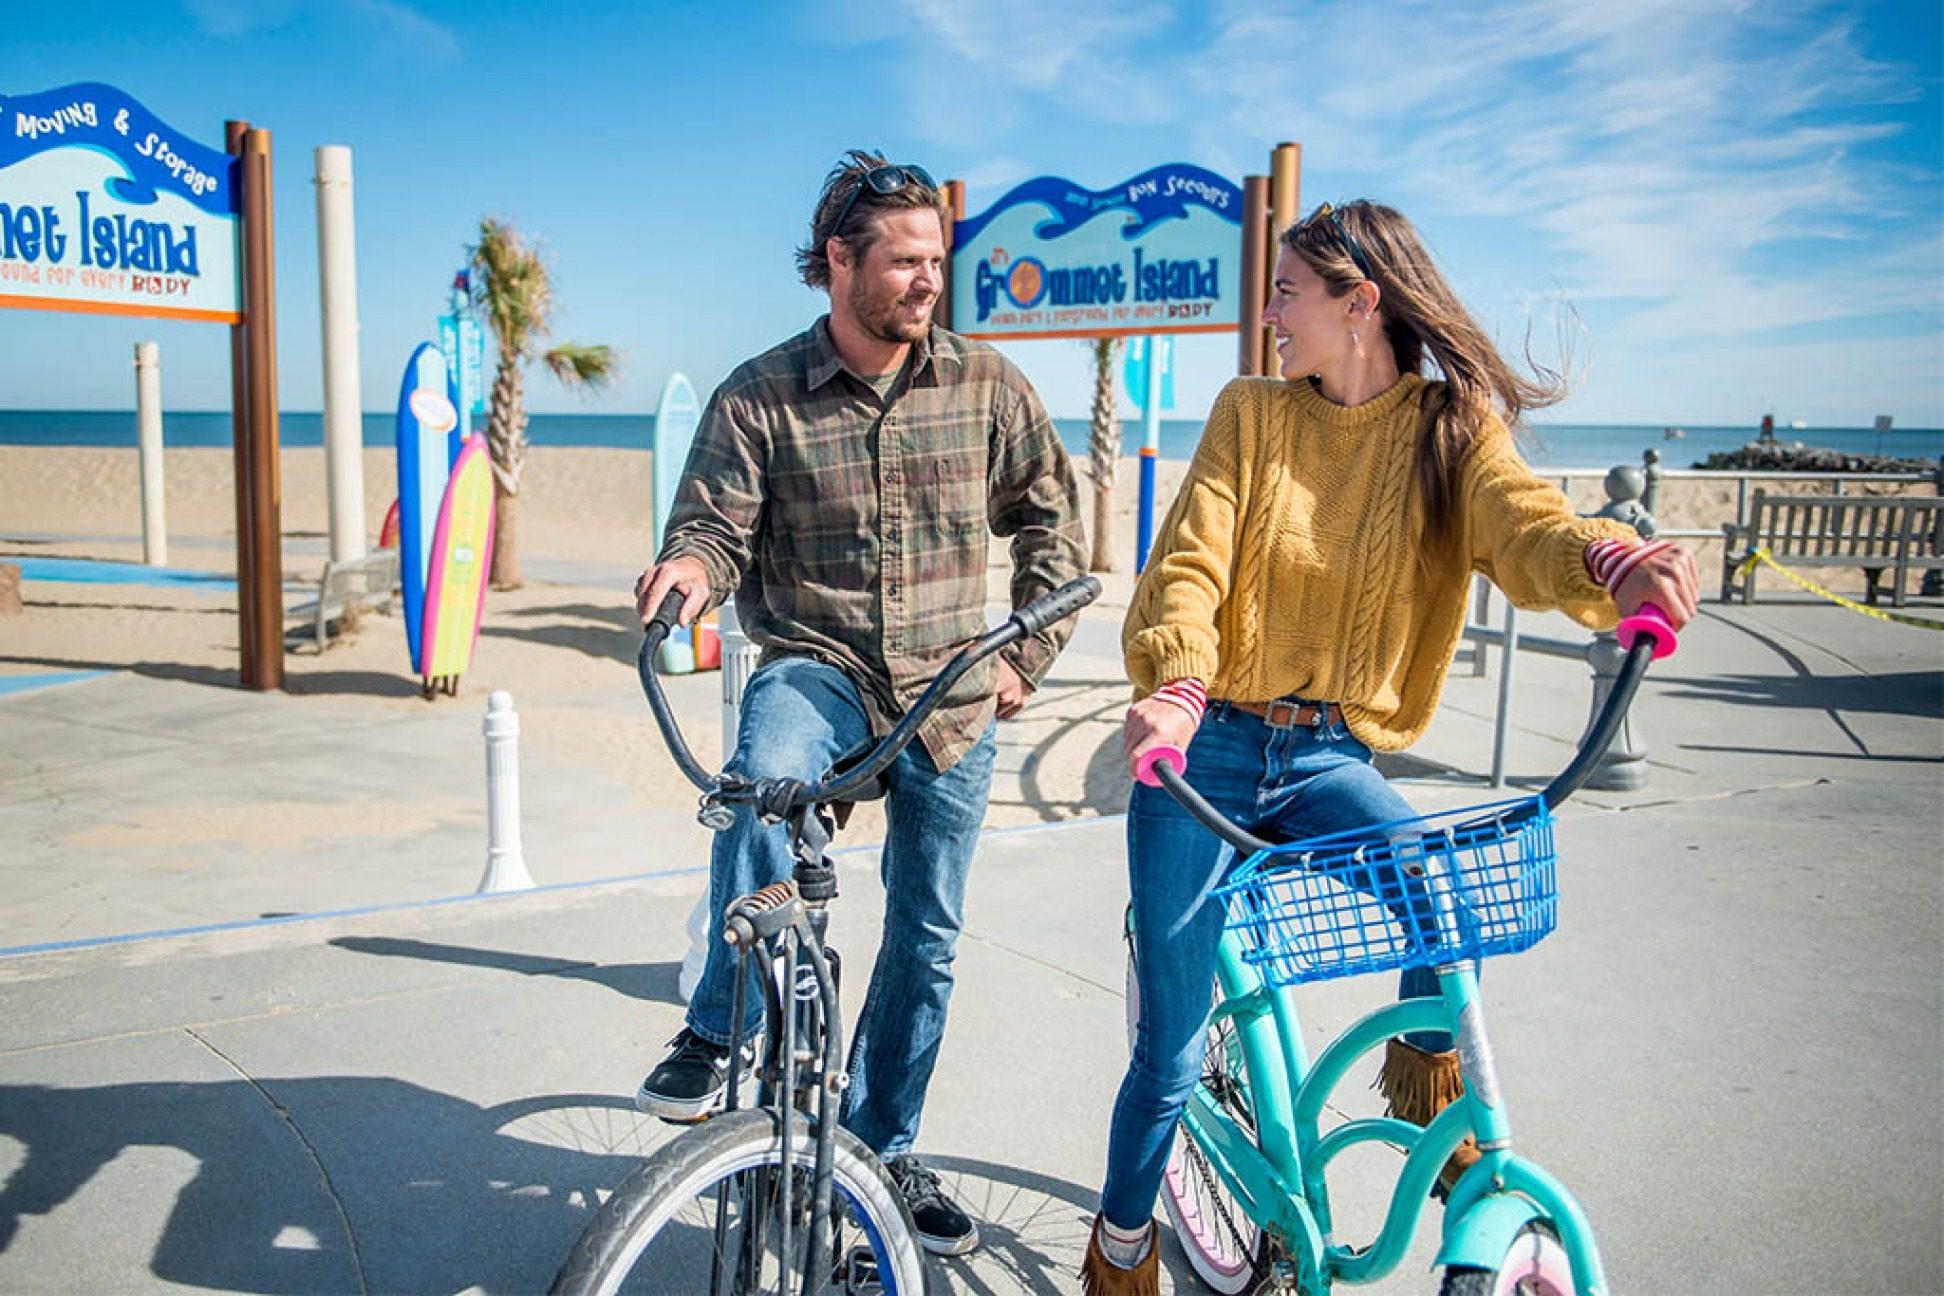 Biking in Virginia Beach